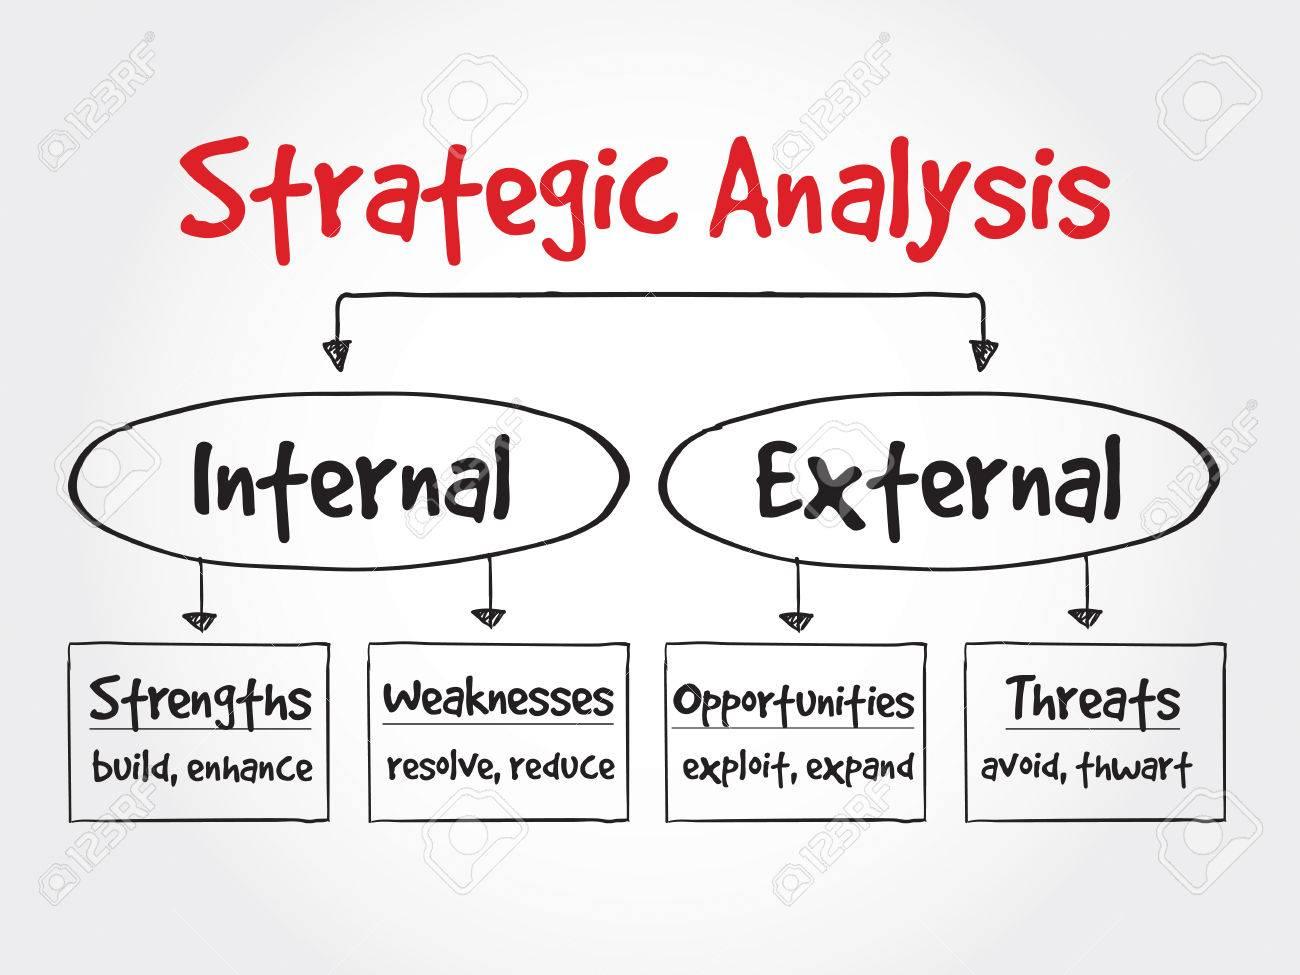 Strategic Analysis flow chart, business concept - 52435673